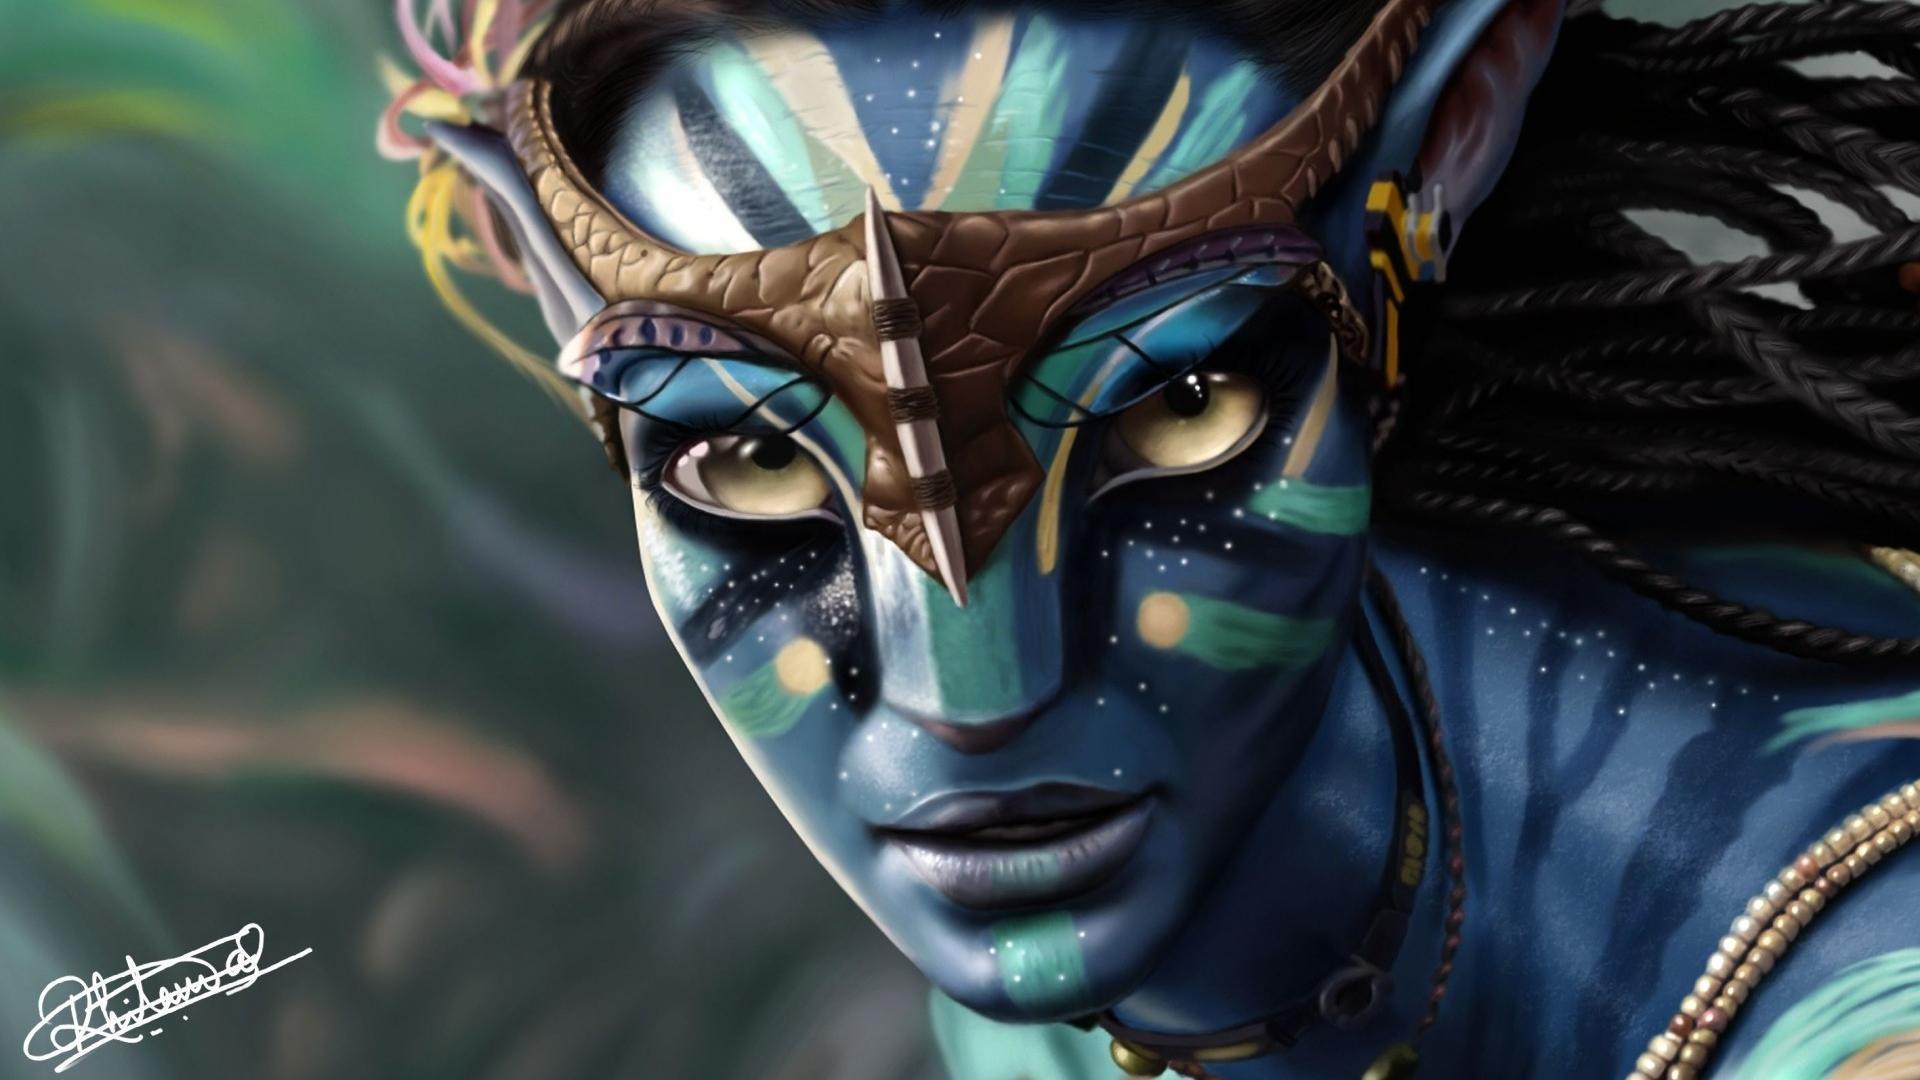 Avatar wallpapers hd